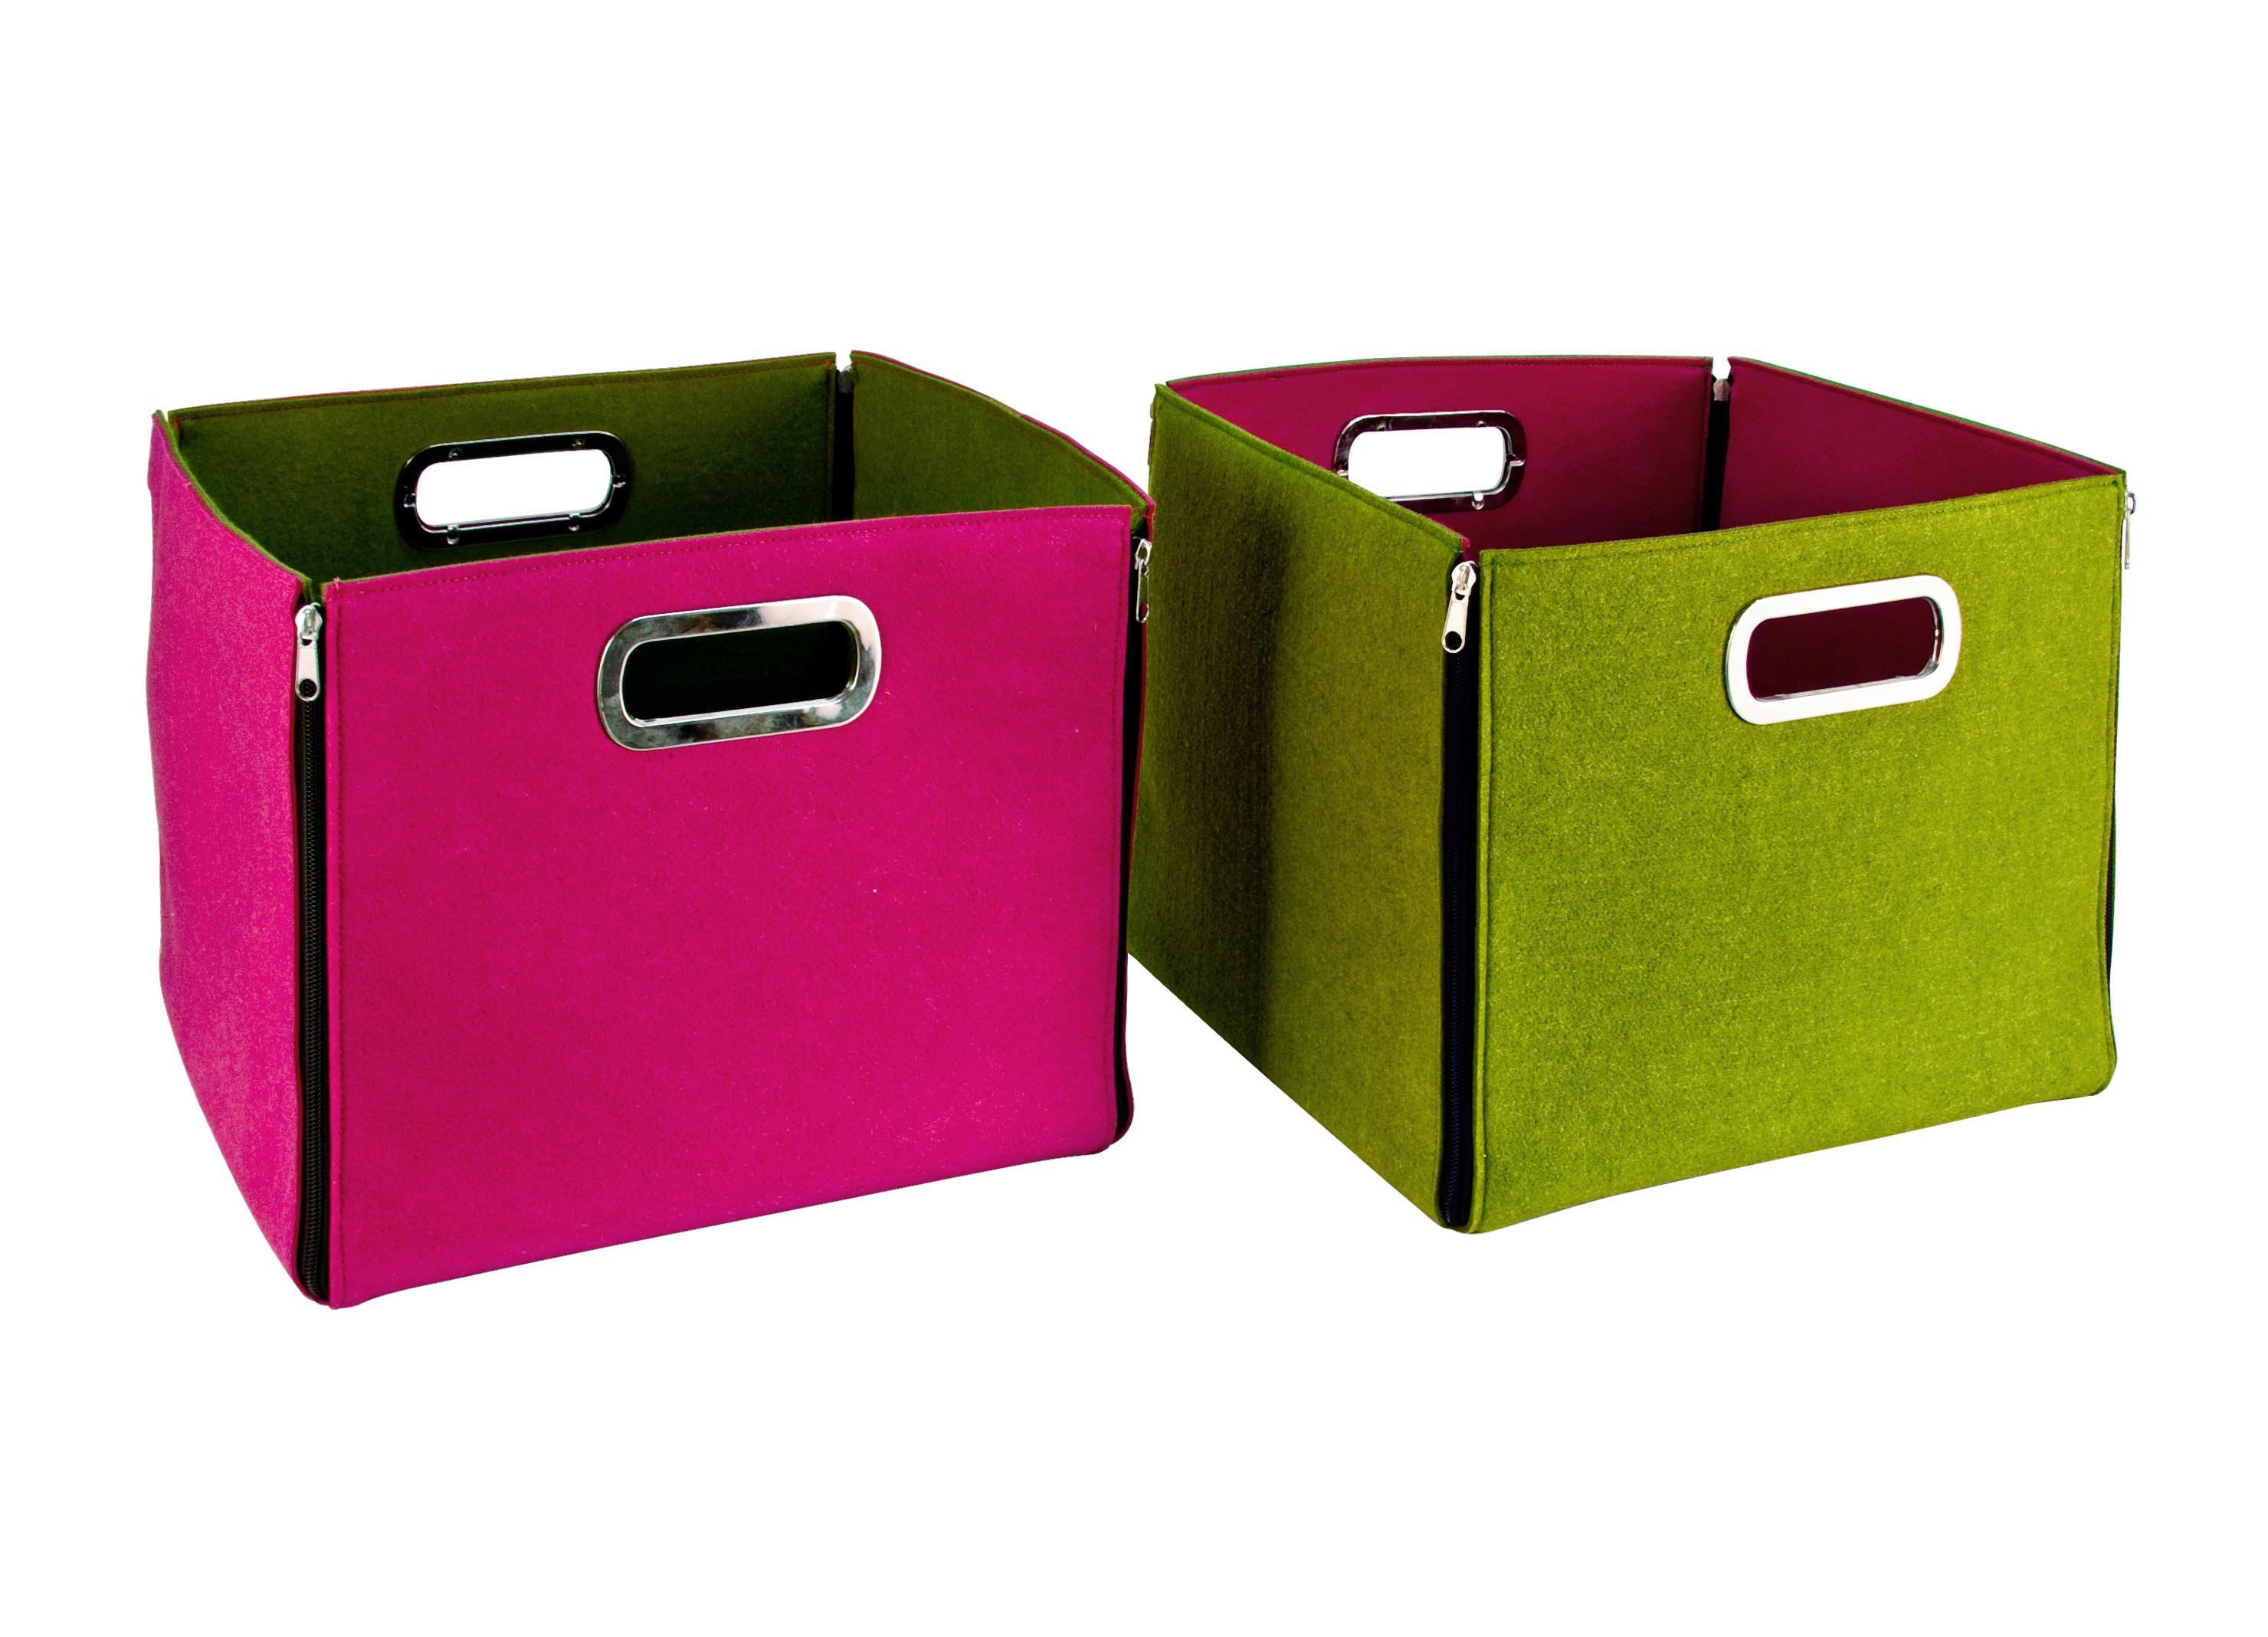 Набор из двух коробок для храненияКоробки<br><br><br>Material: Шерсть<br>Length см: None<br>Width см: 32.5<br>Depth см: 32.5<br>Height см: 30